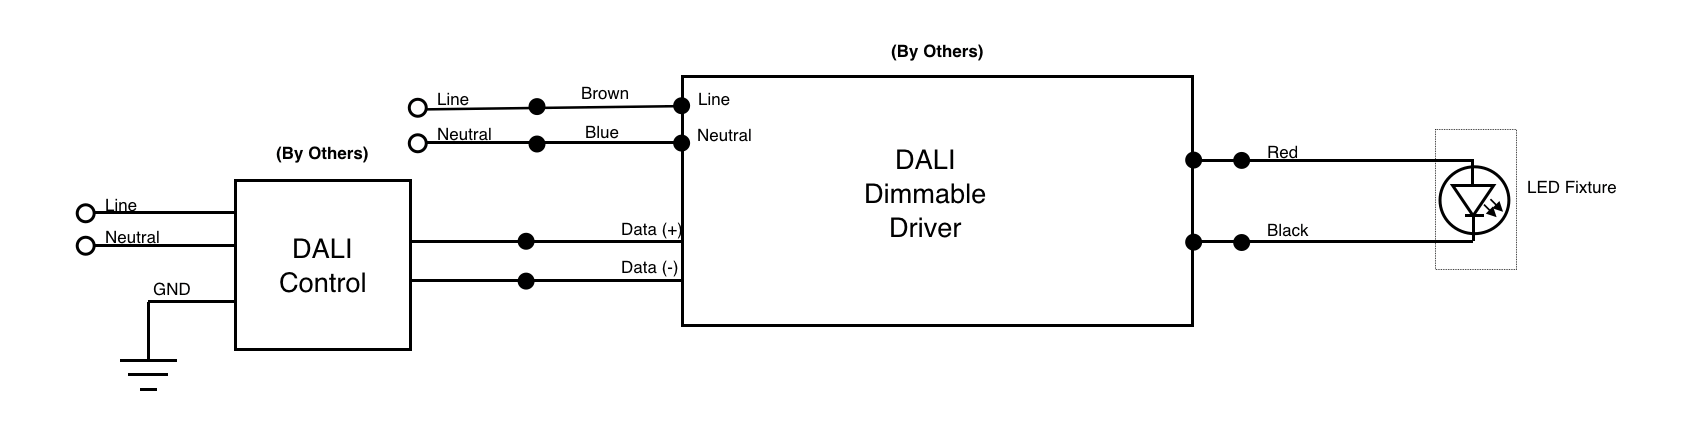 Lutron 0 10v Dimmer Switch Wiring Diagram